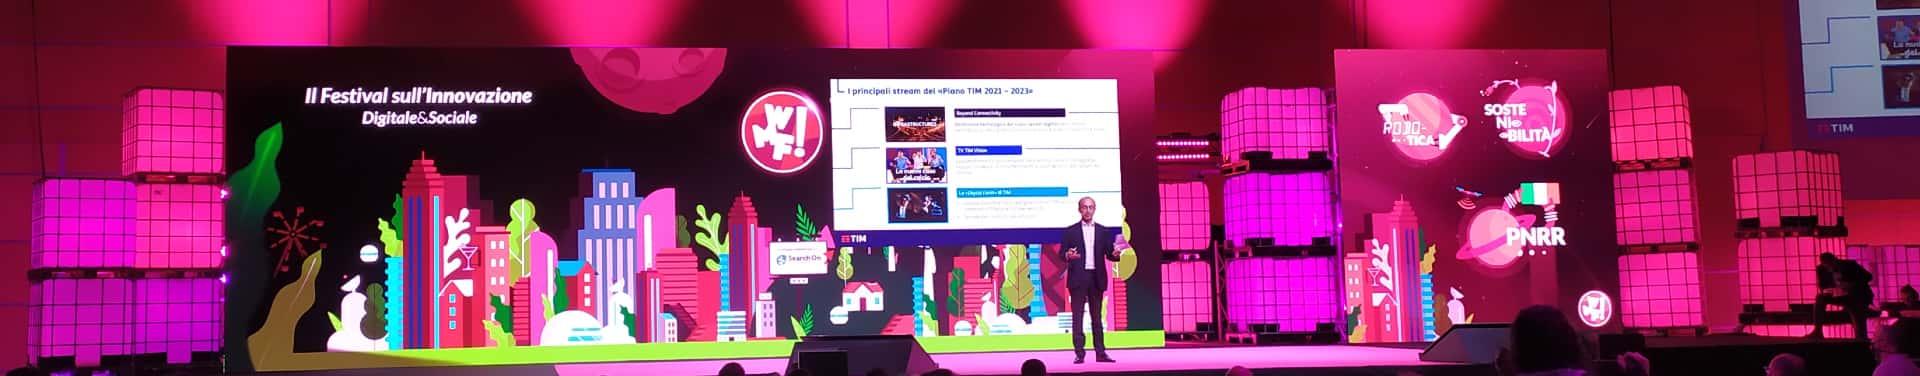 Web Marketing Festival 2021 - Main Stage